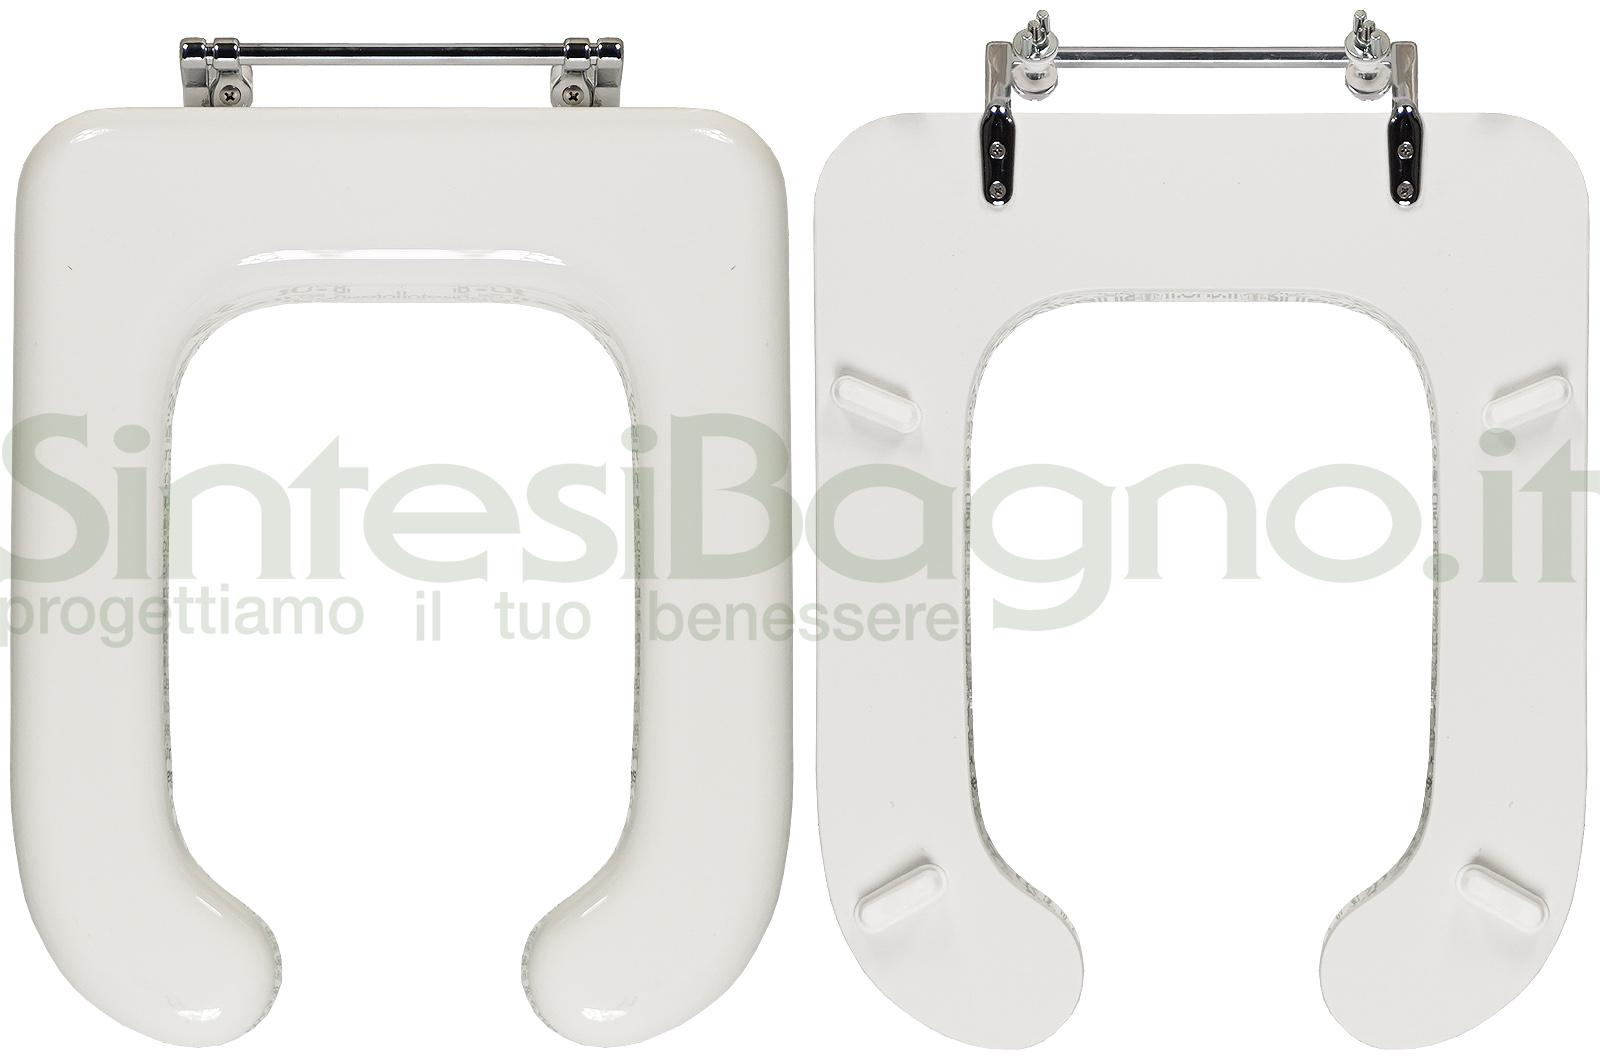 Sedile Wc Disabili Ideal Standard.Copriwater Per Wc Conca Disabili Ideal Standard Legno Ricoperto Sintesibagno Shop Online